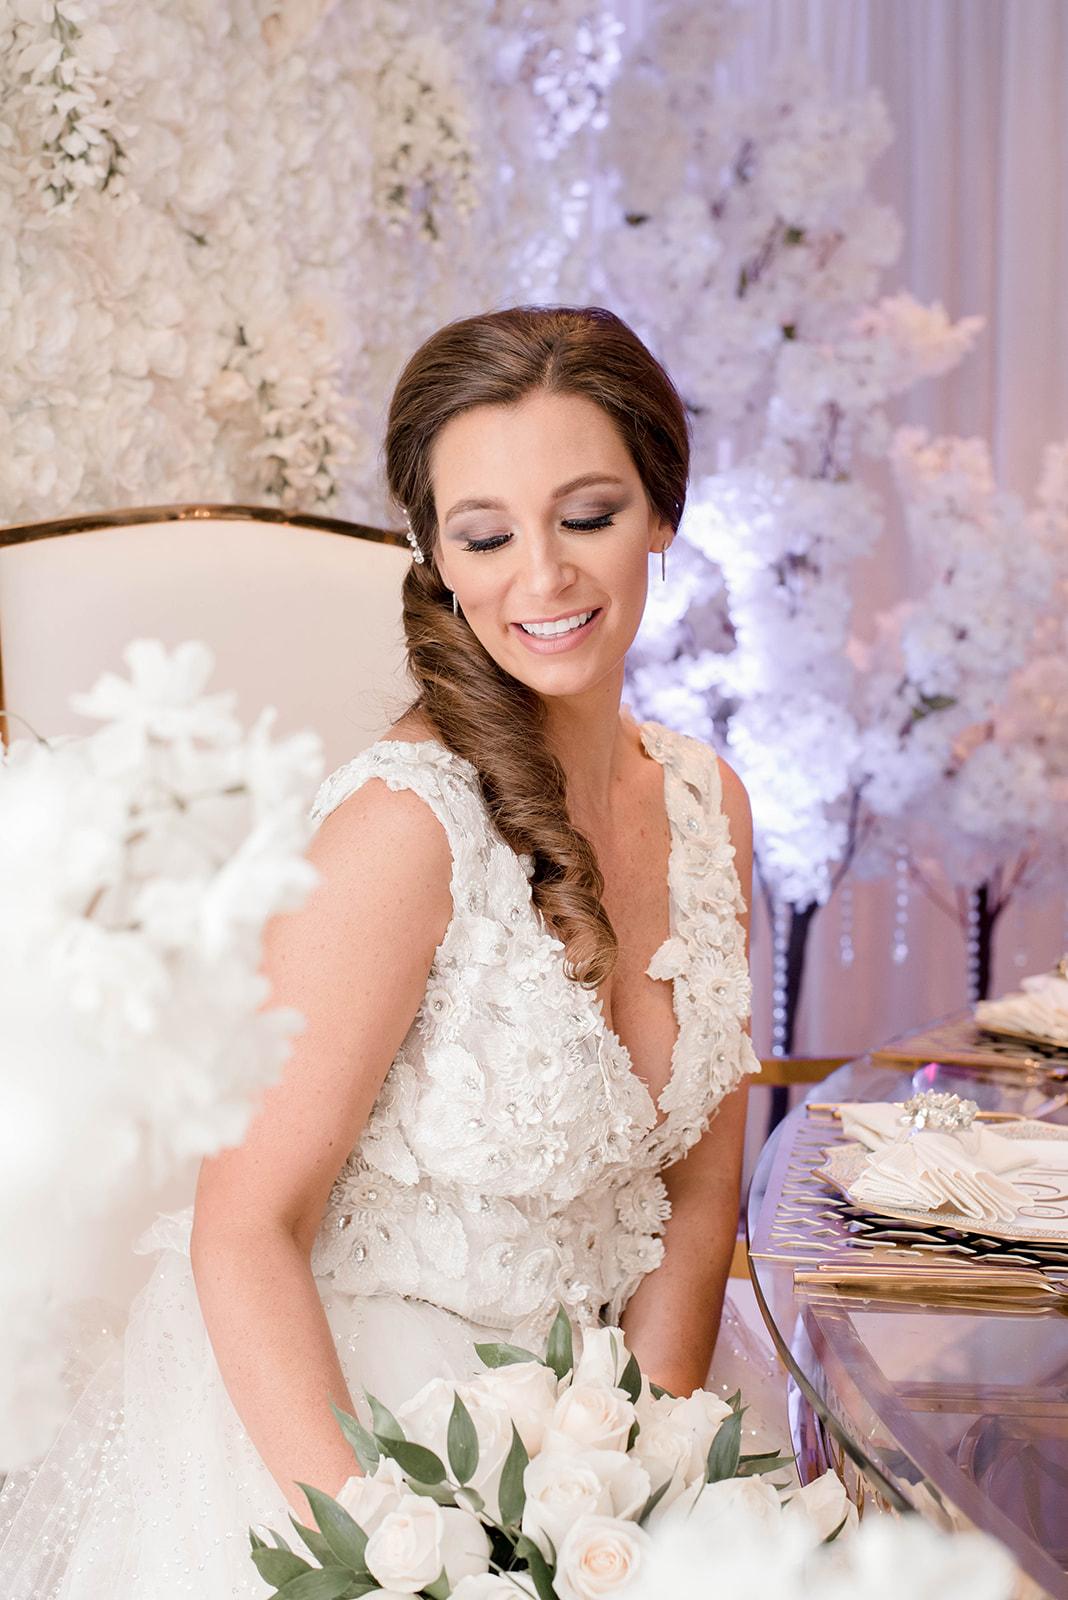 An Exquisite Bridal Showcase-4796_websize.jpg